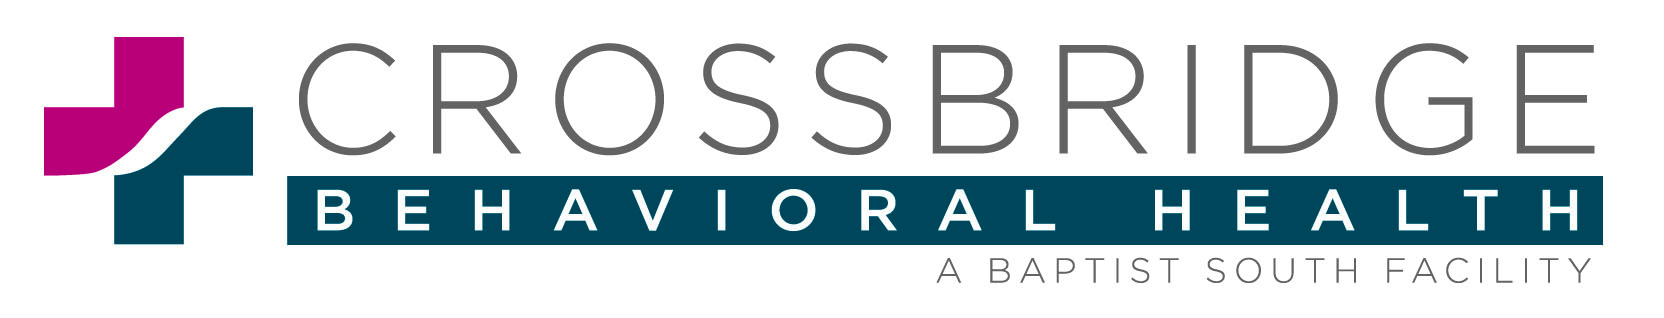 Crossbridge logo